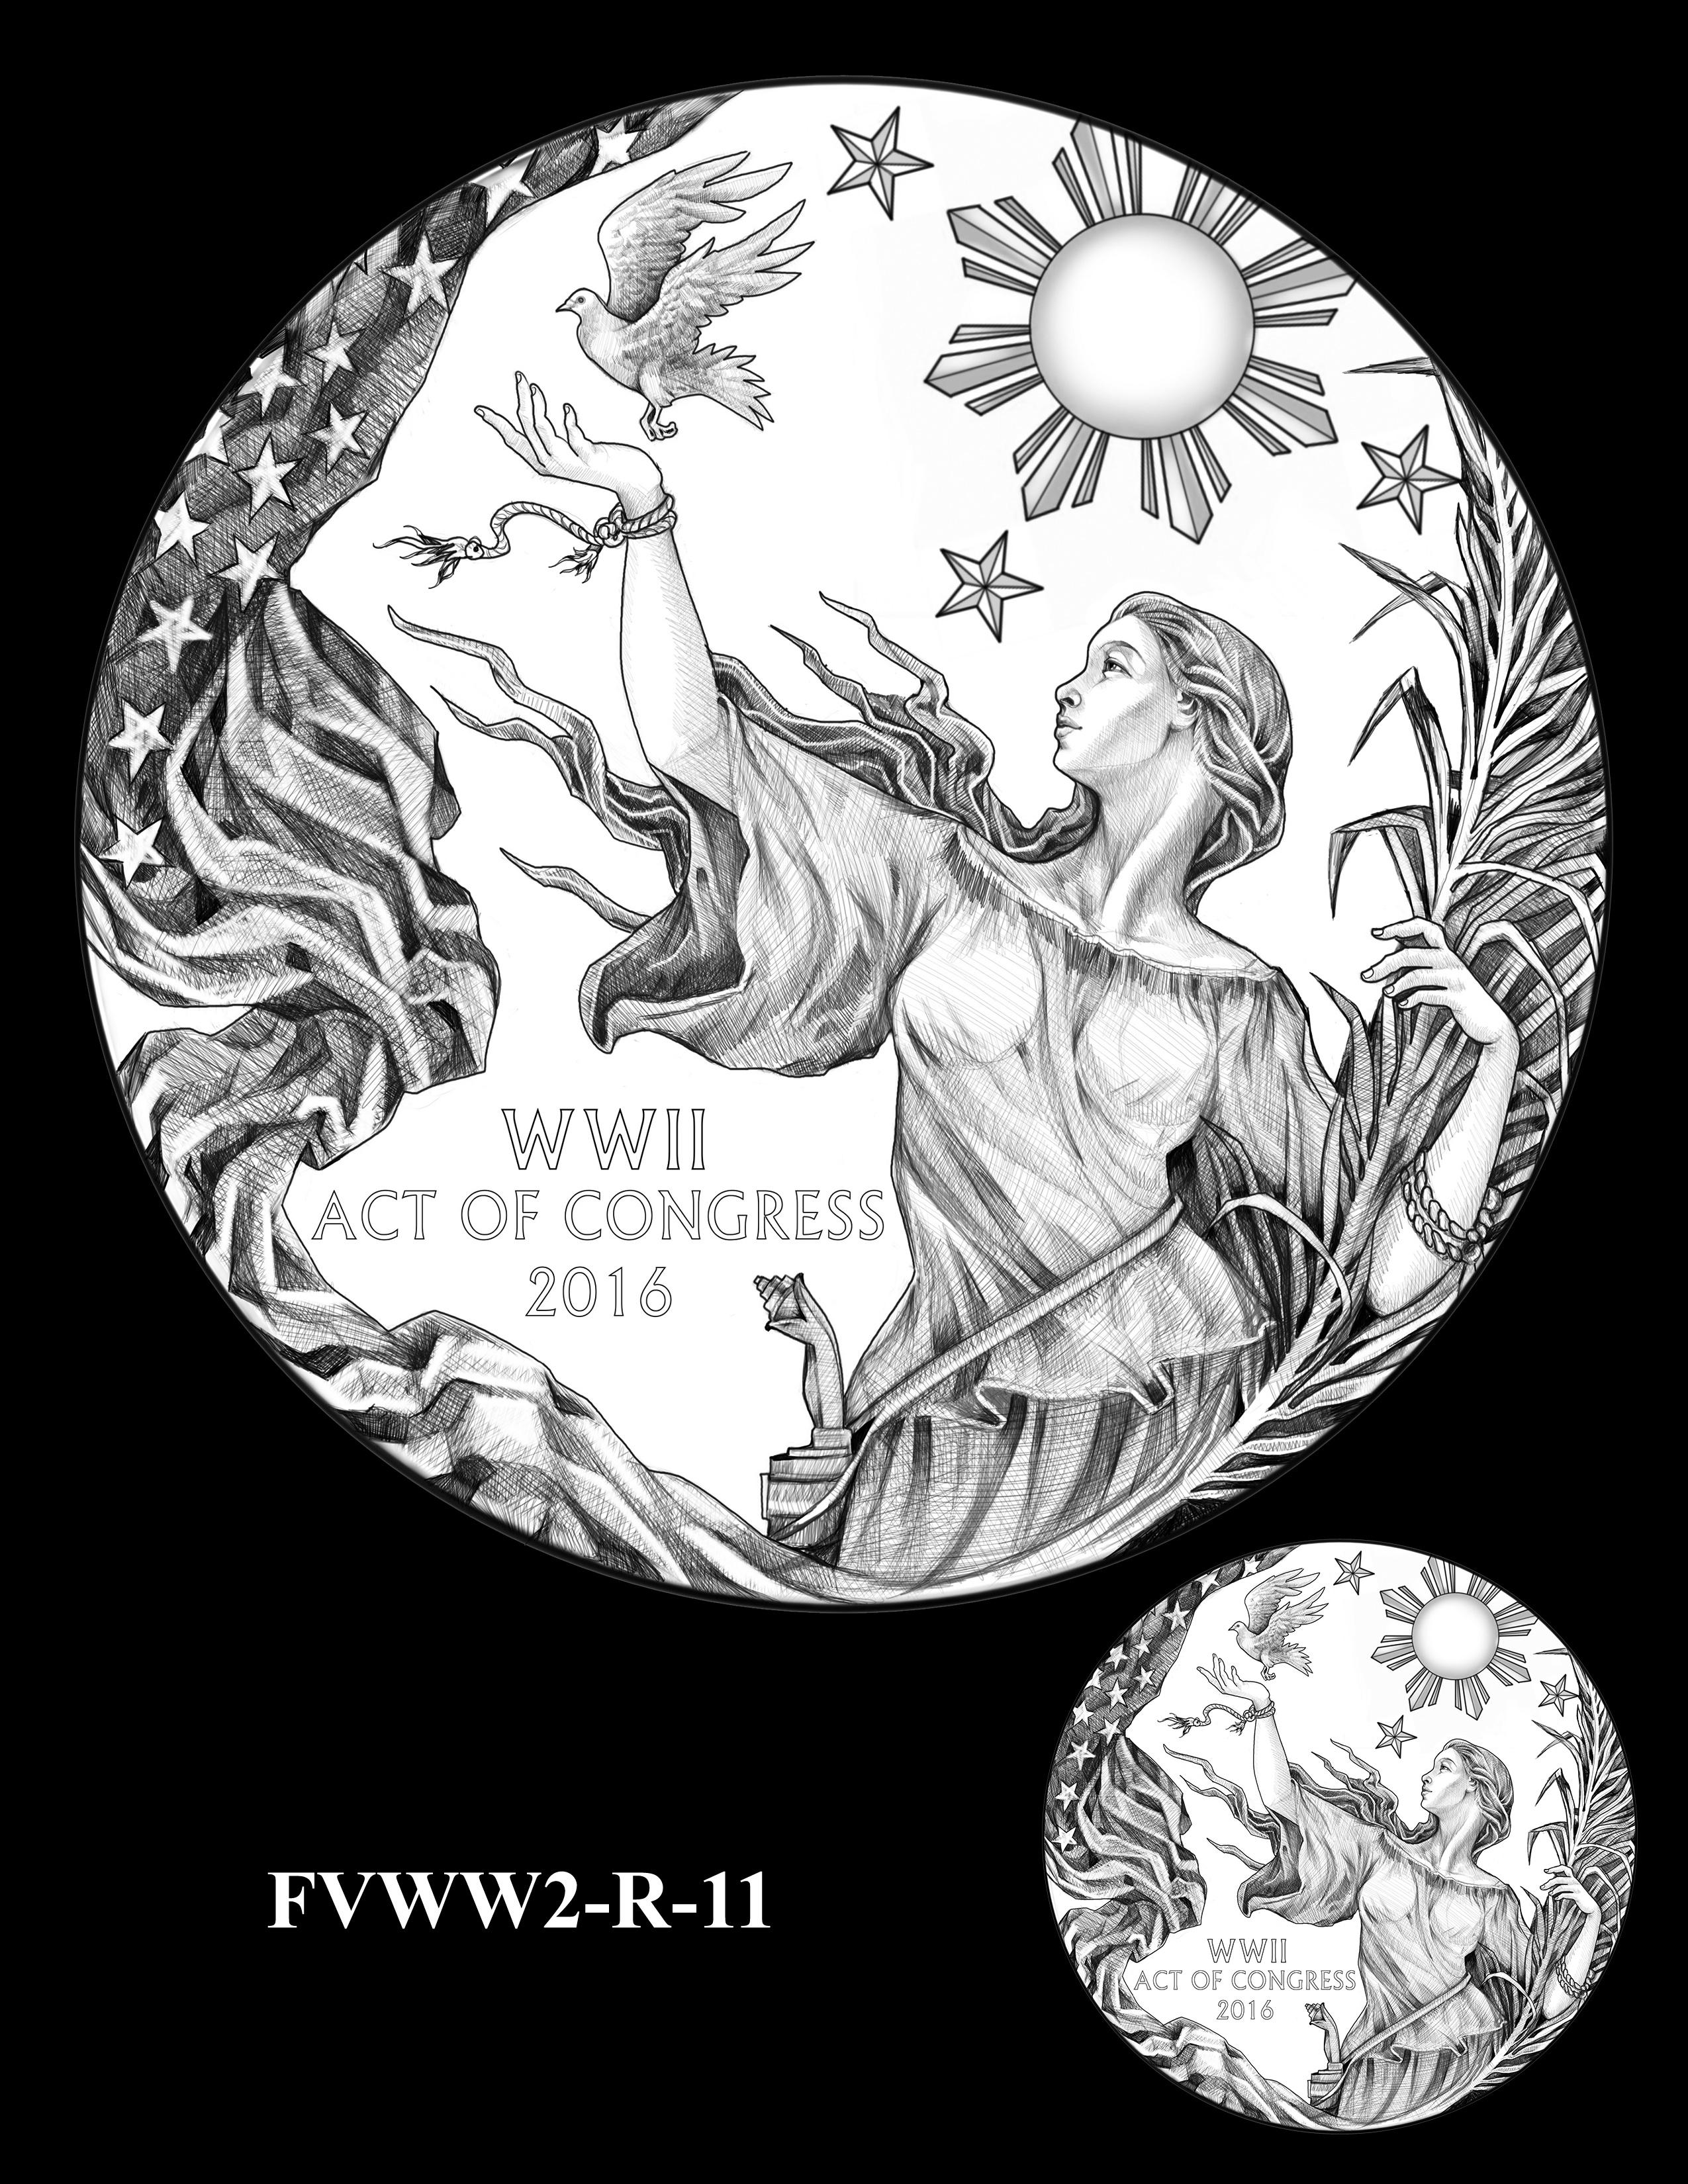 FVWW2-R-11 -- Filipino Veterans of World War II Congressional Gold Medal